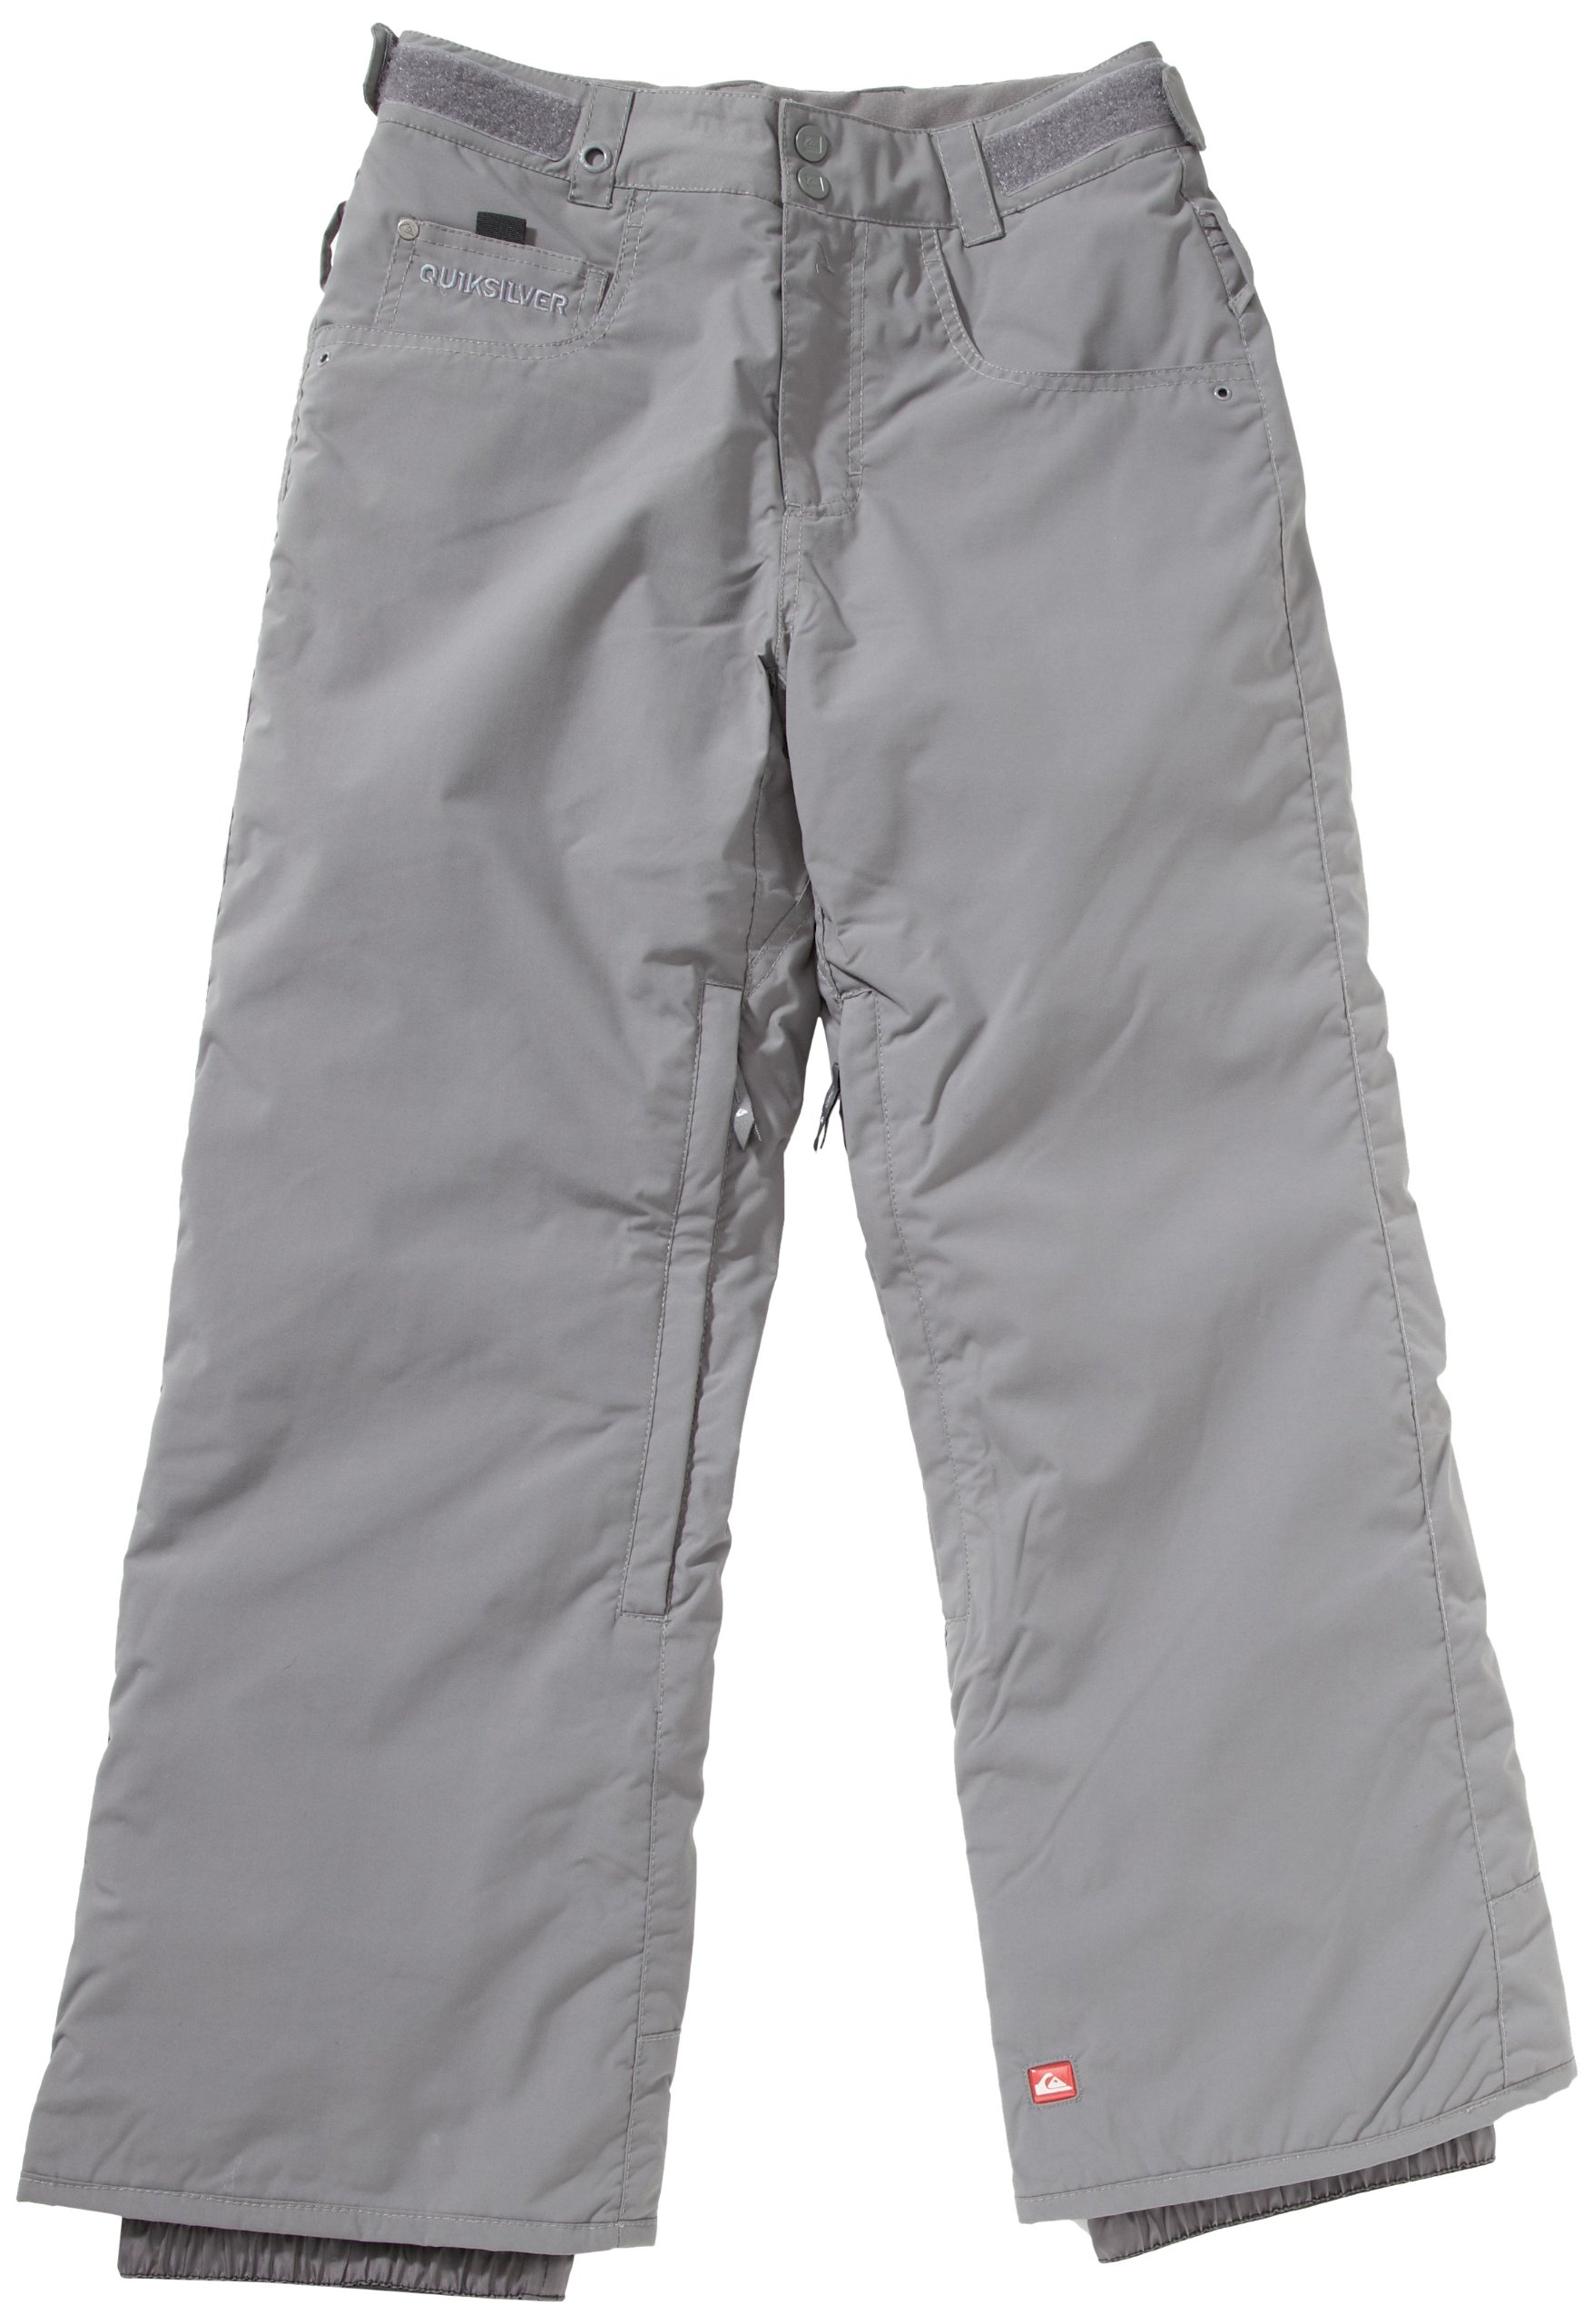 Quiksilver Drizzle – Pantalones para niño